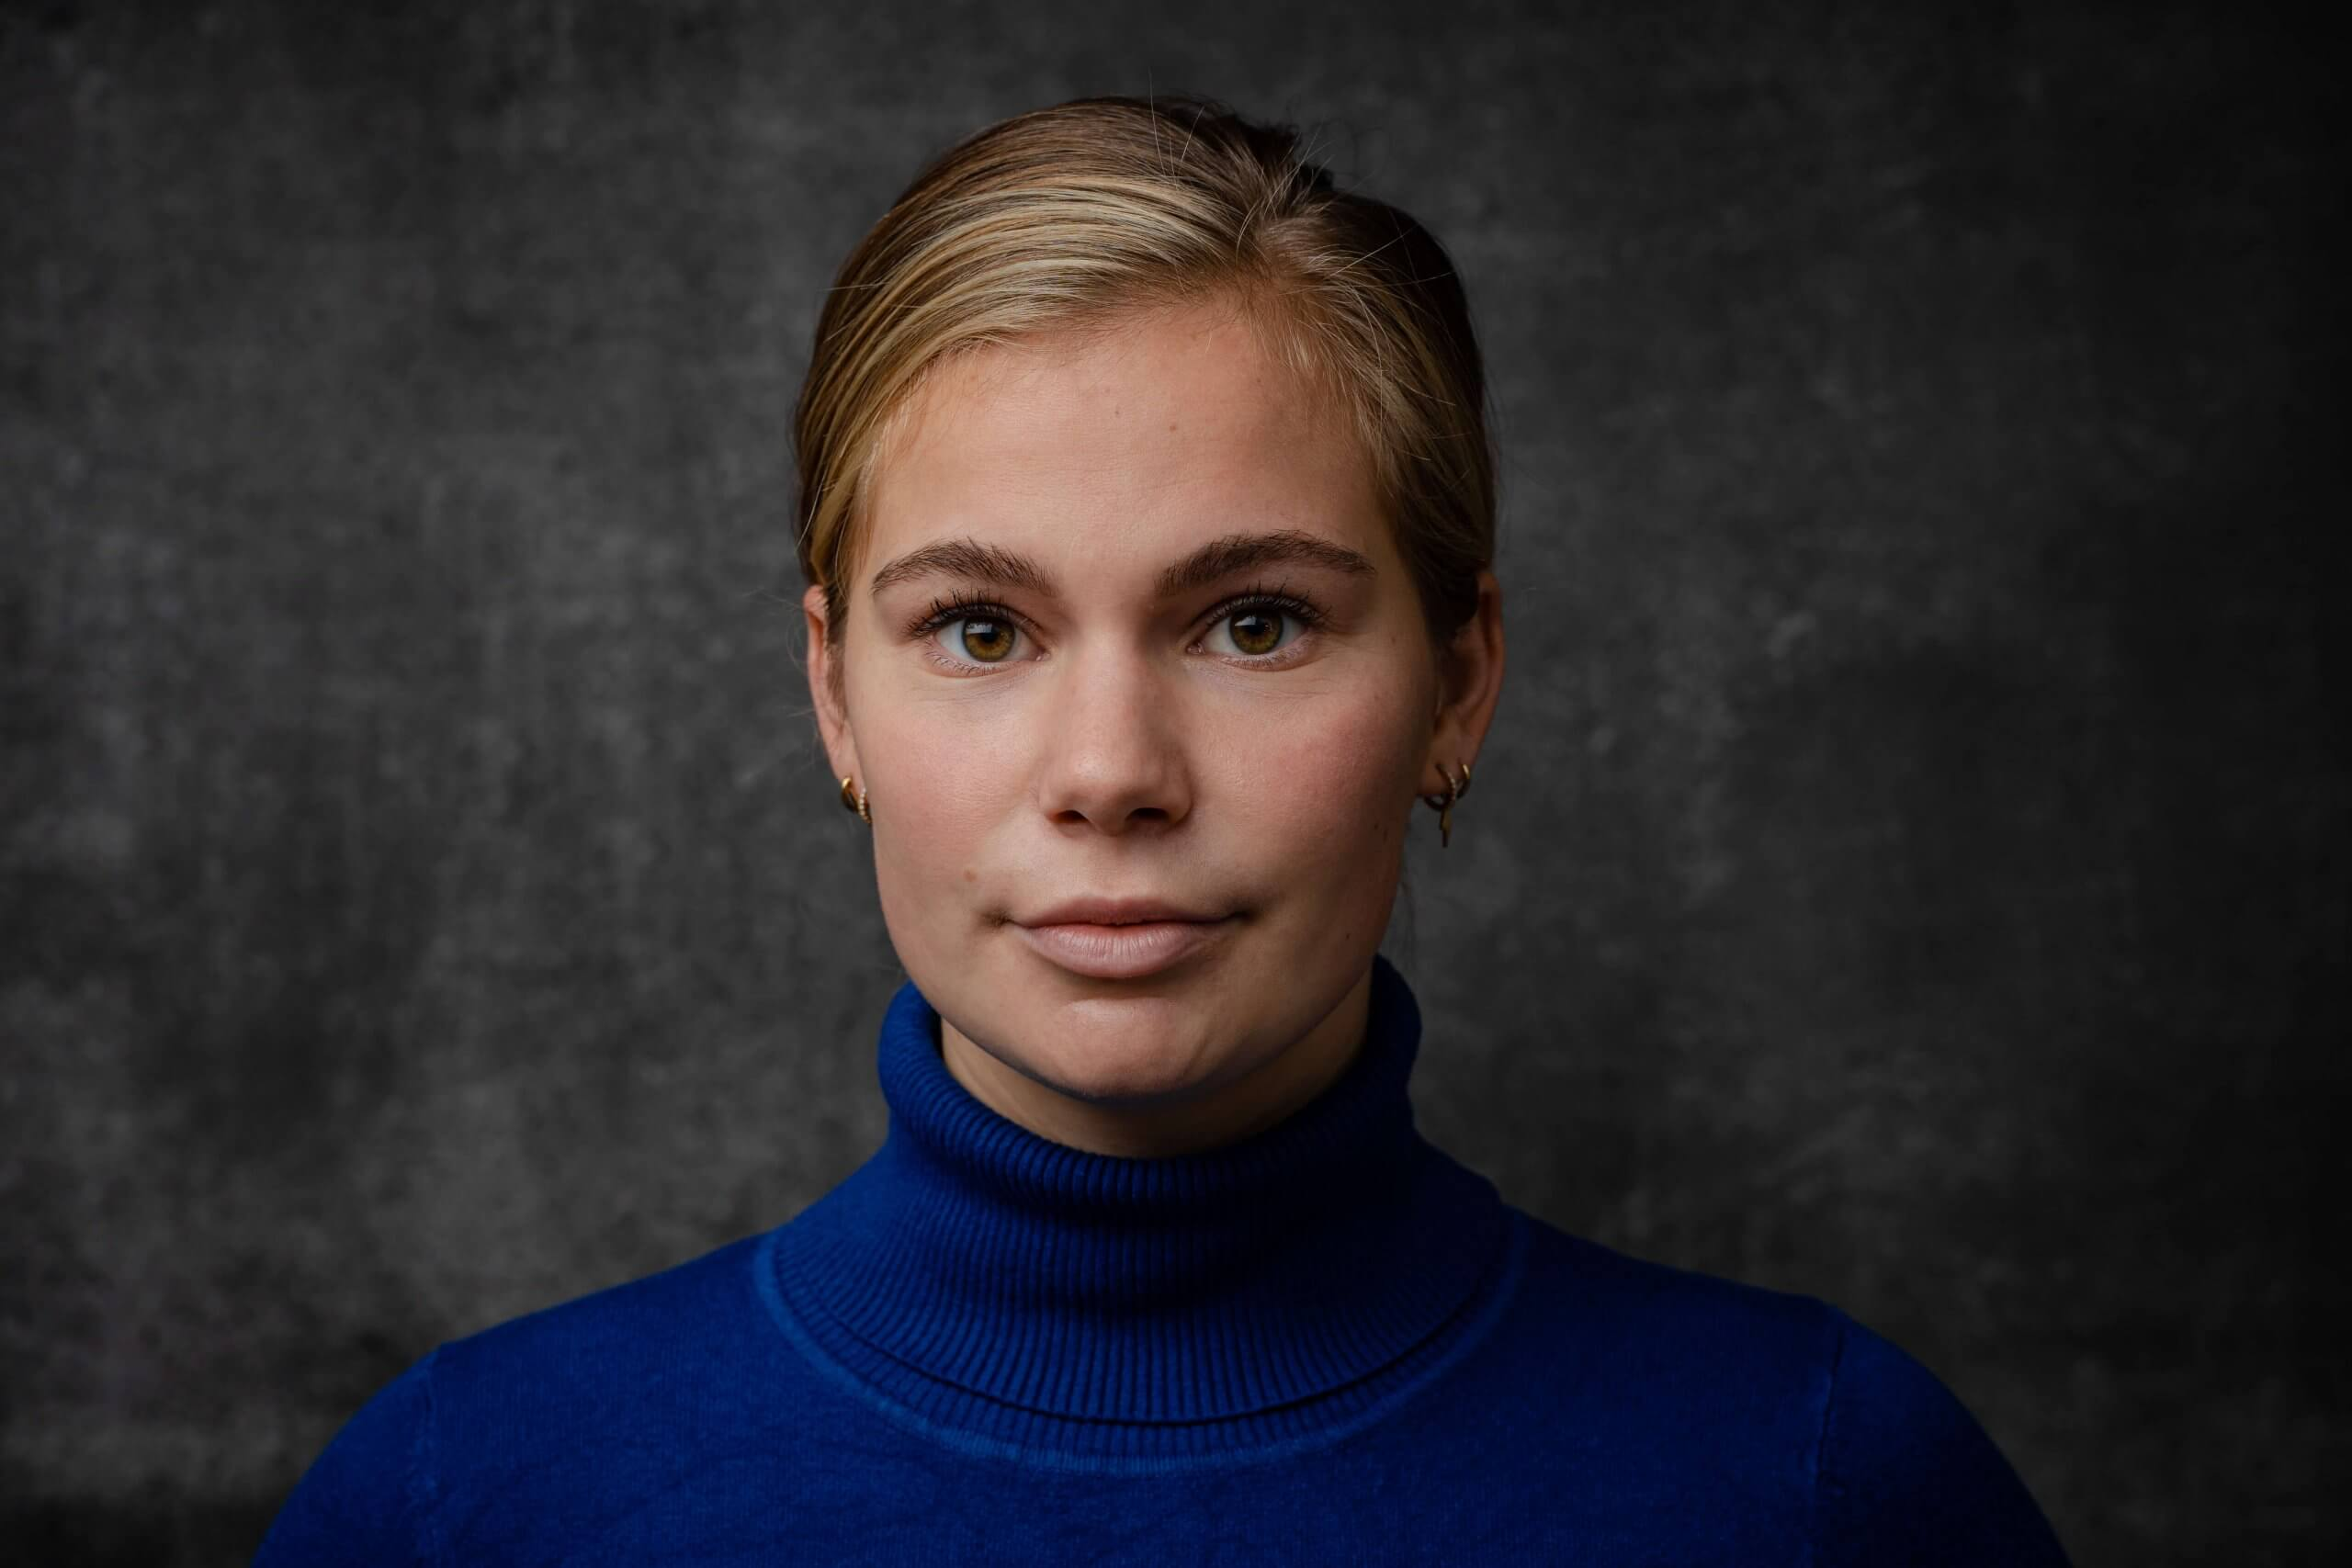 Portret, vrouw dame studio fotoachtergronden fotoshoot meisje portrait